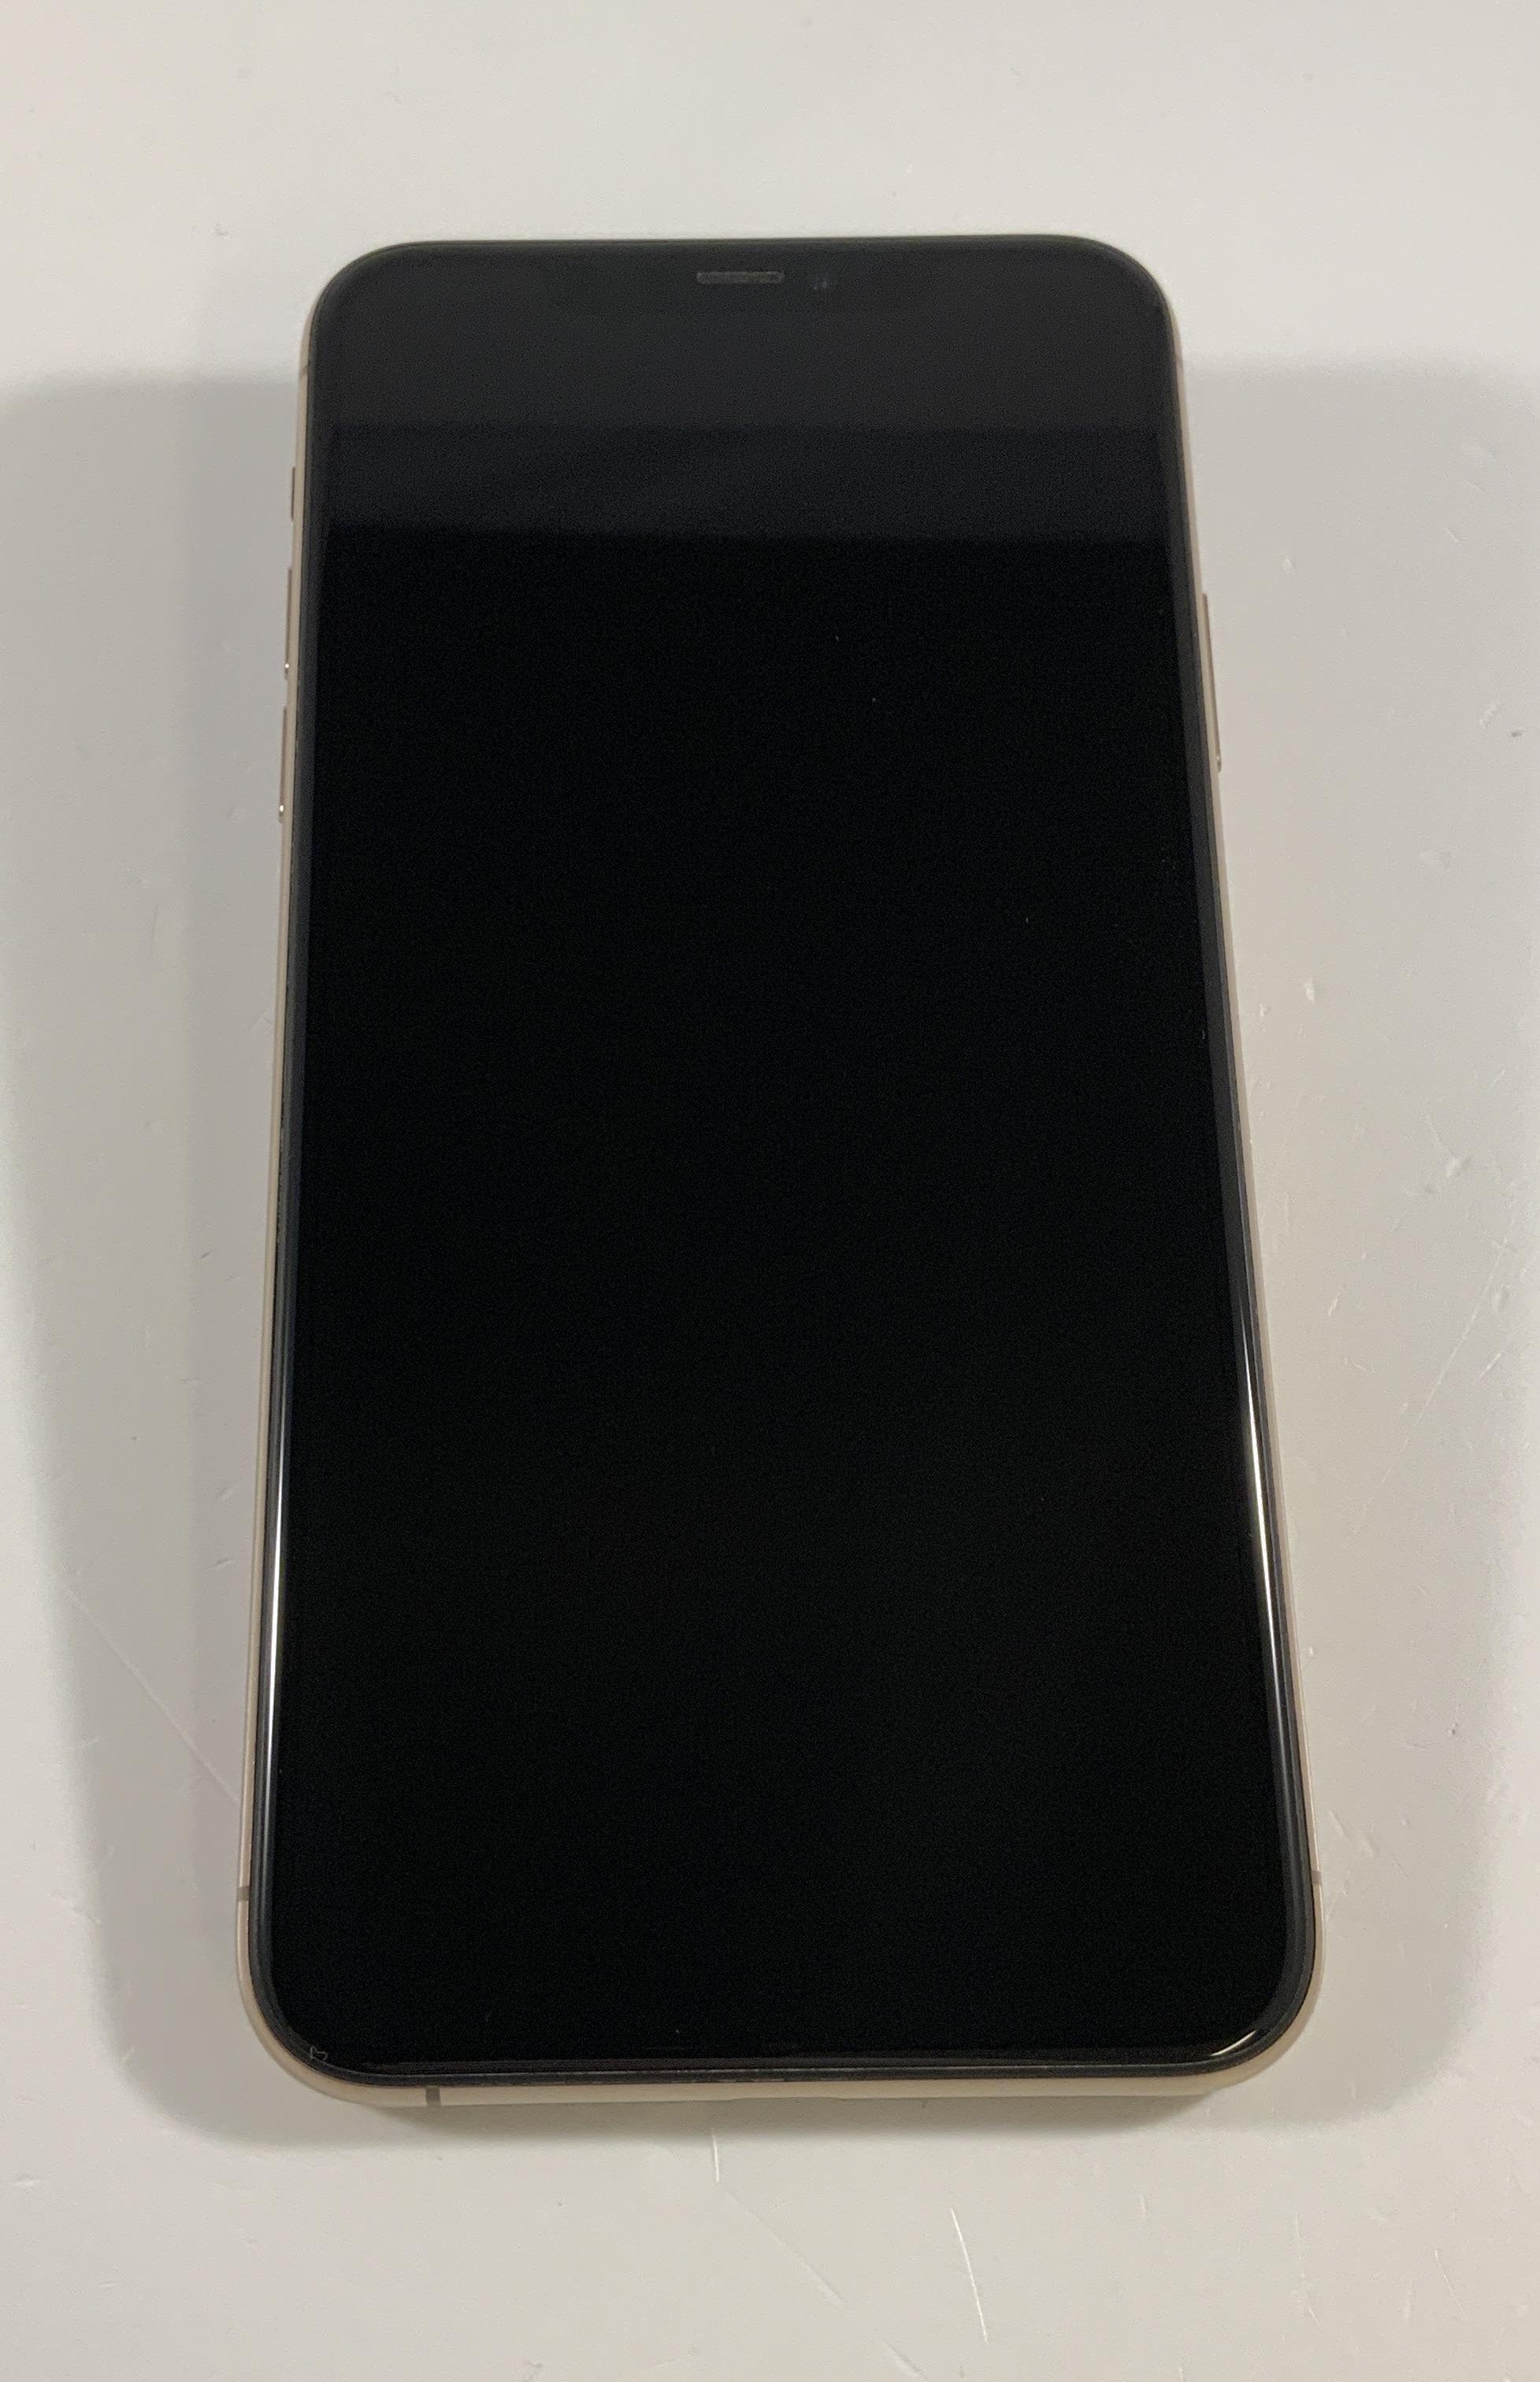 iPhone 11 Pro Max 512GB, 512GB, Gold, immagine 1